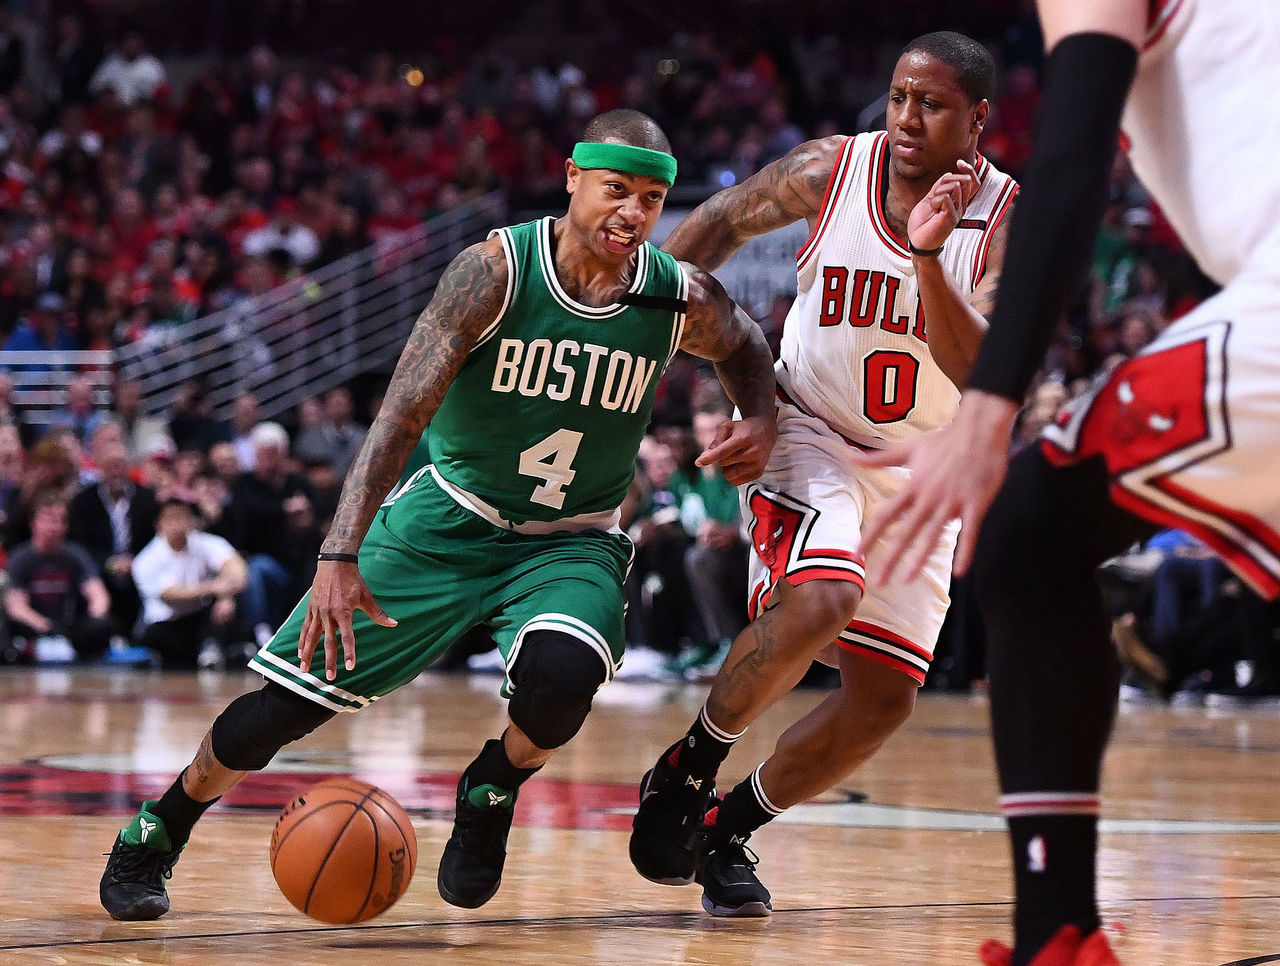 Cropped 2017 04 24t005105z 1378137582 nocid rtrmadp 3 nba playoffs boston celtics at chicago bulls